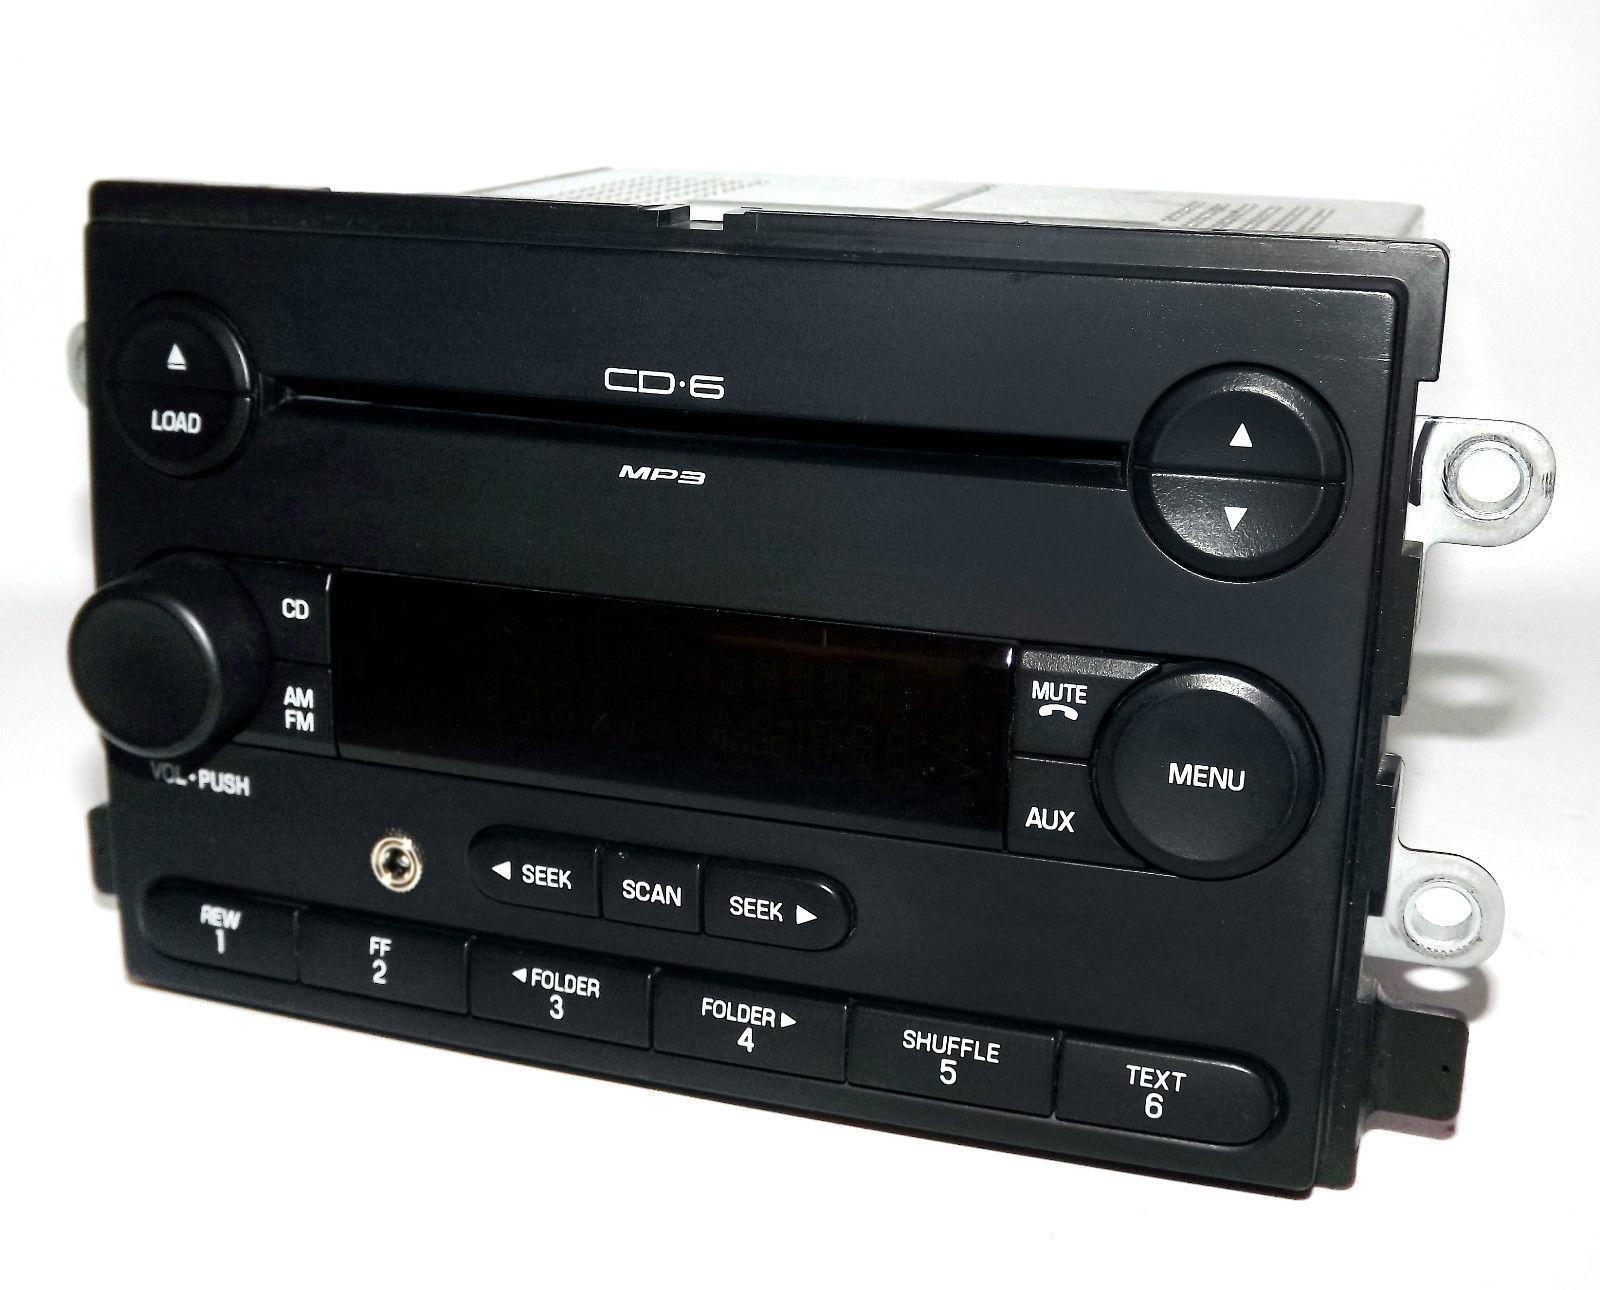 Ford Freestyle 06 07 Am Fm 6 Disc Mp3 Cd Radio W Aux Input Part Karaoke  Machine Wiring Diagram Auxillery Ipod Wiring Diagram Ford